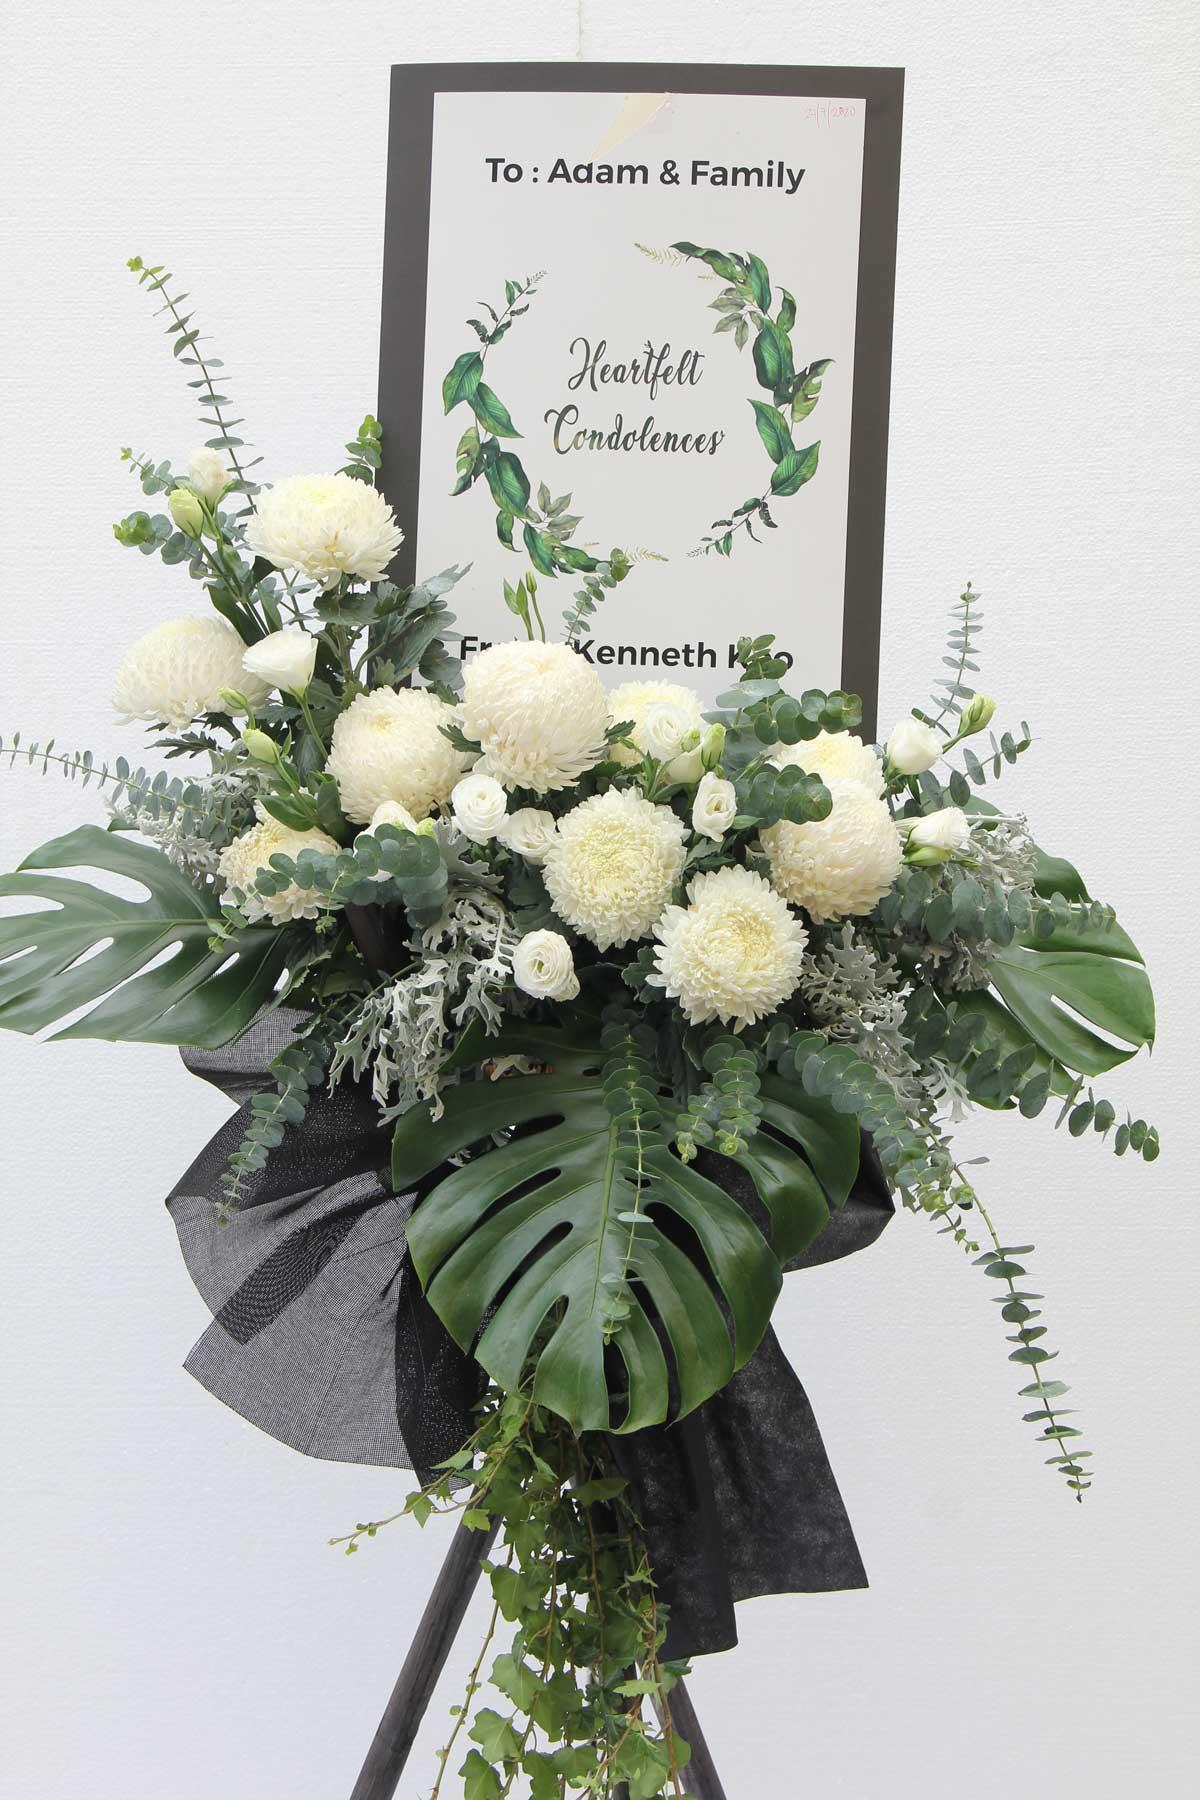 Heartfelt Wreath Stand | Condolence Flowers | Eska Creative Gifting